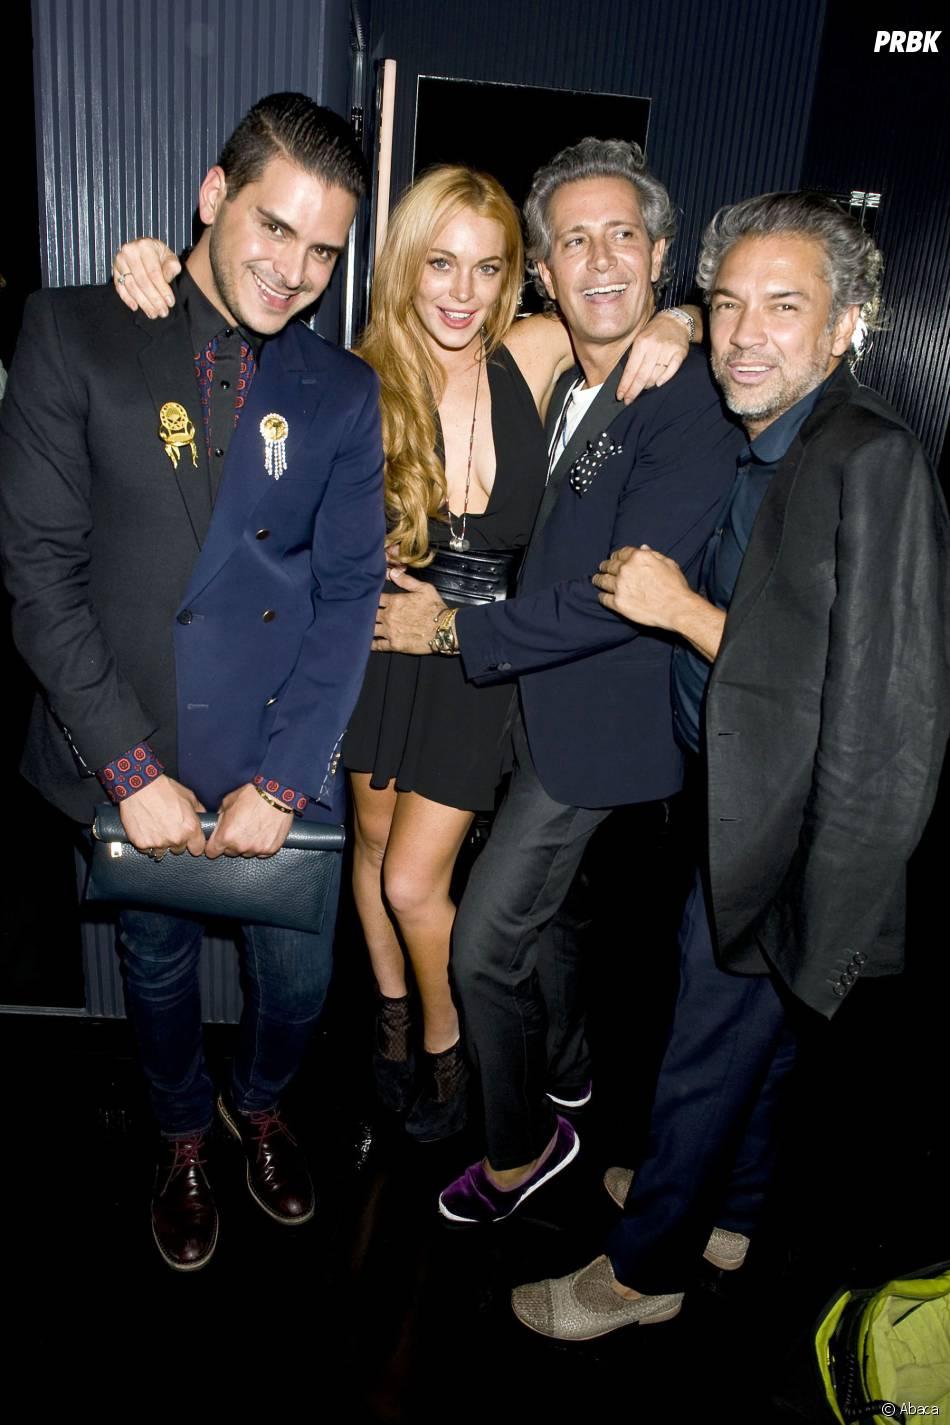 Lindsay Lohan, Markus Molinari et ses amis, le 11 septembre 2013 à New York